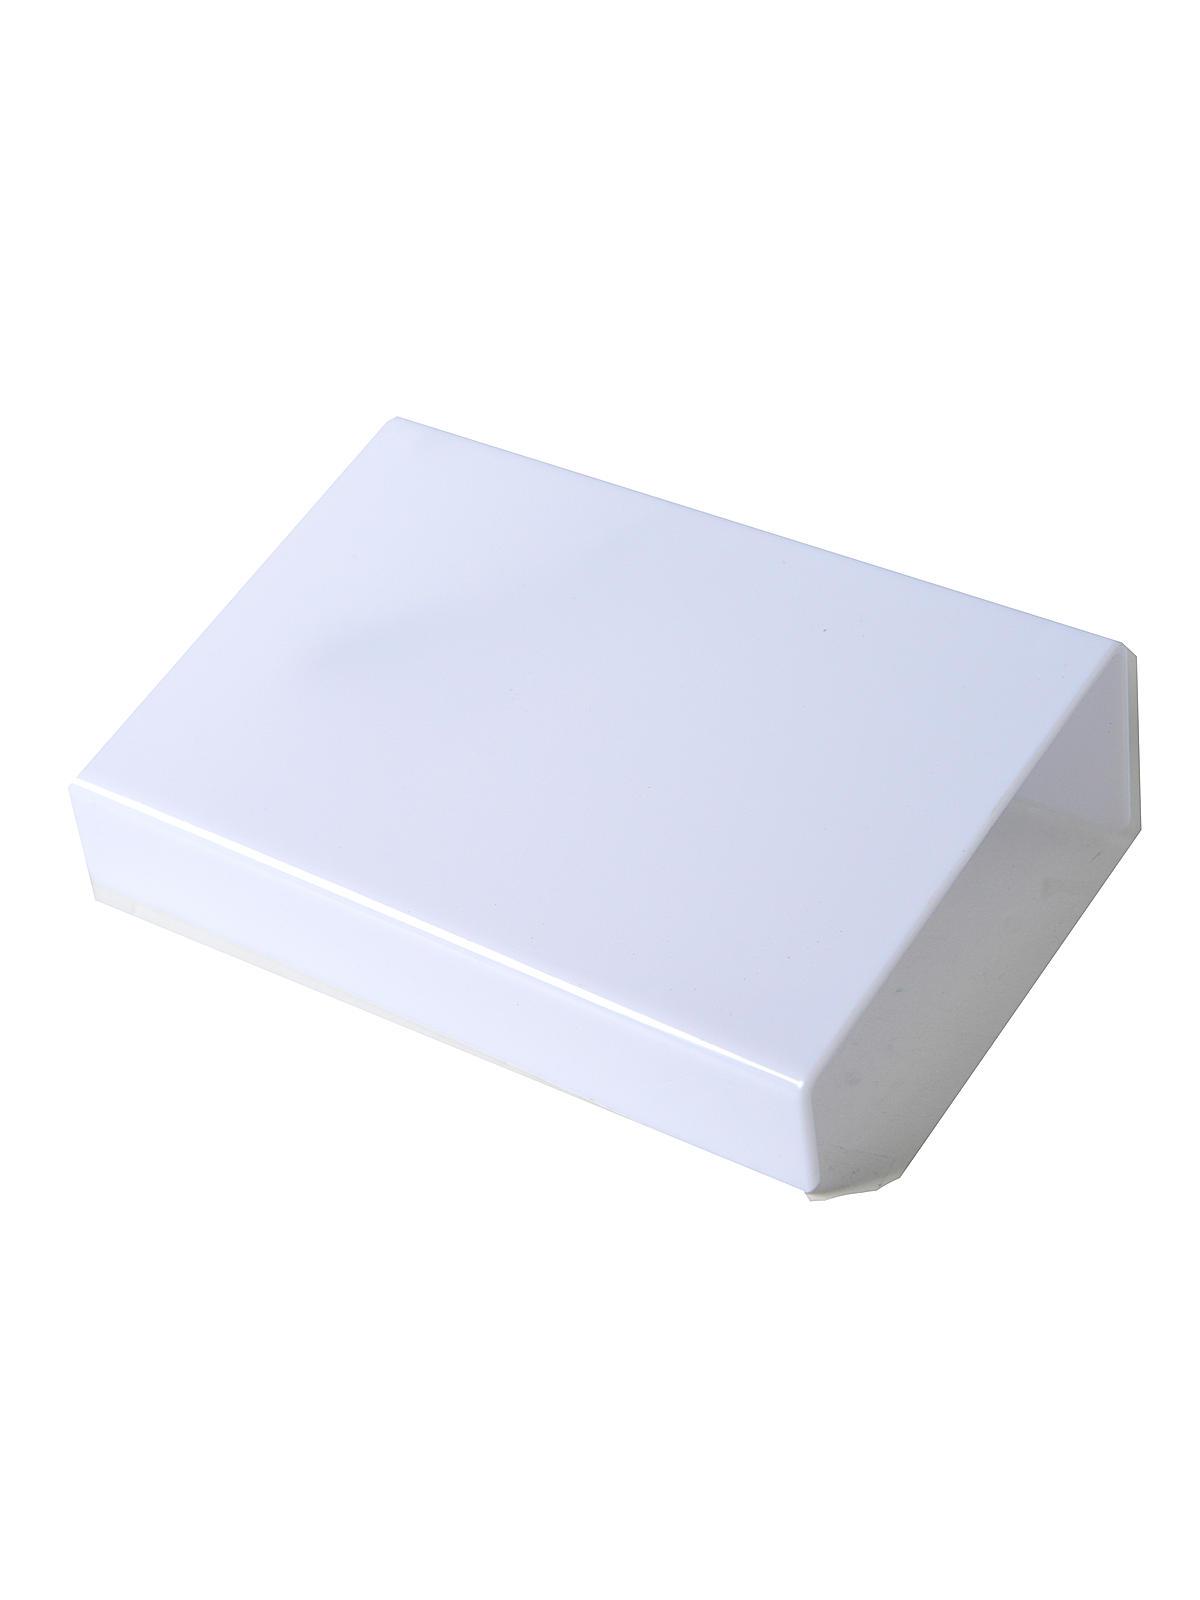 Stencil Classics Light Box